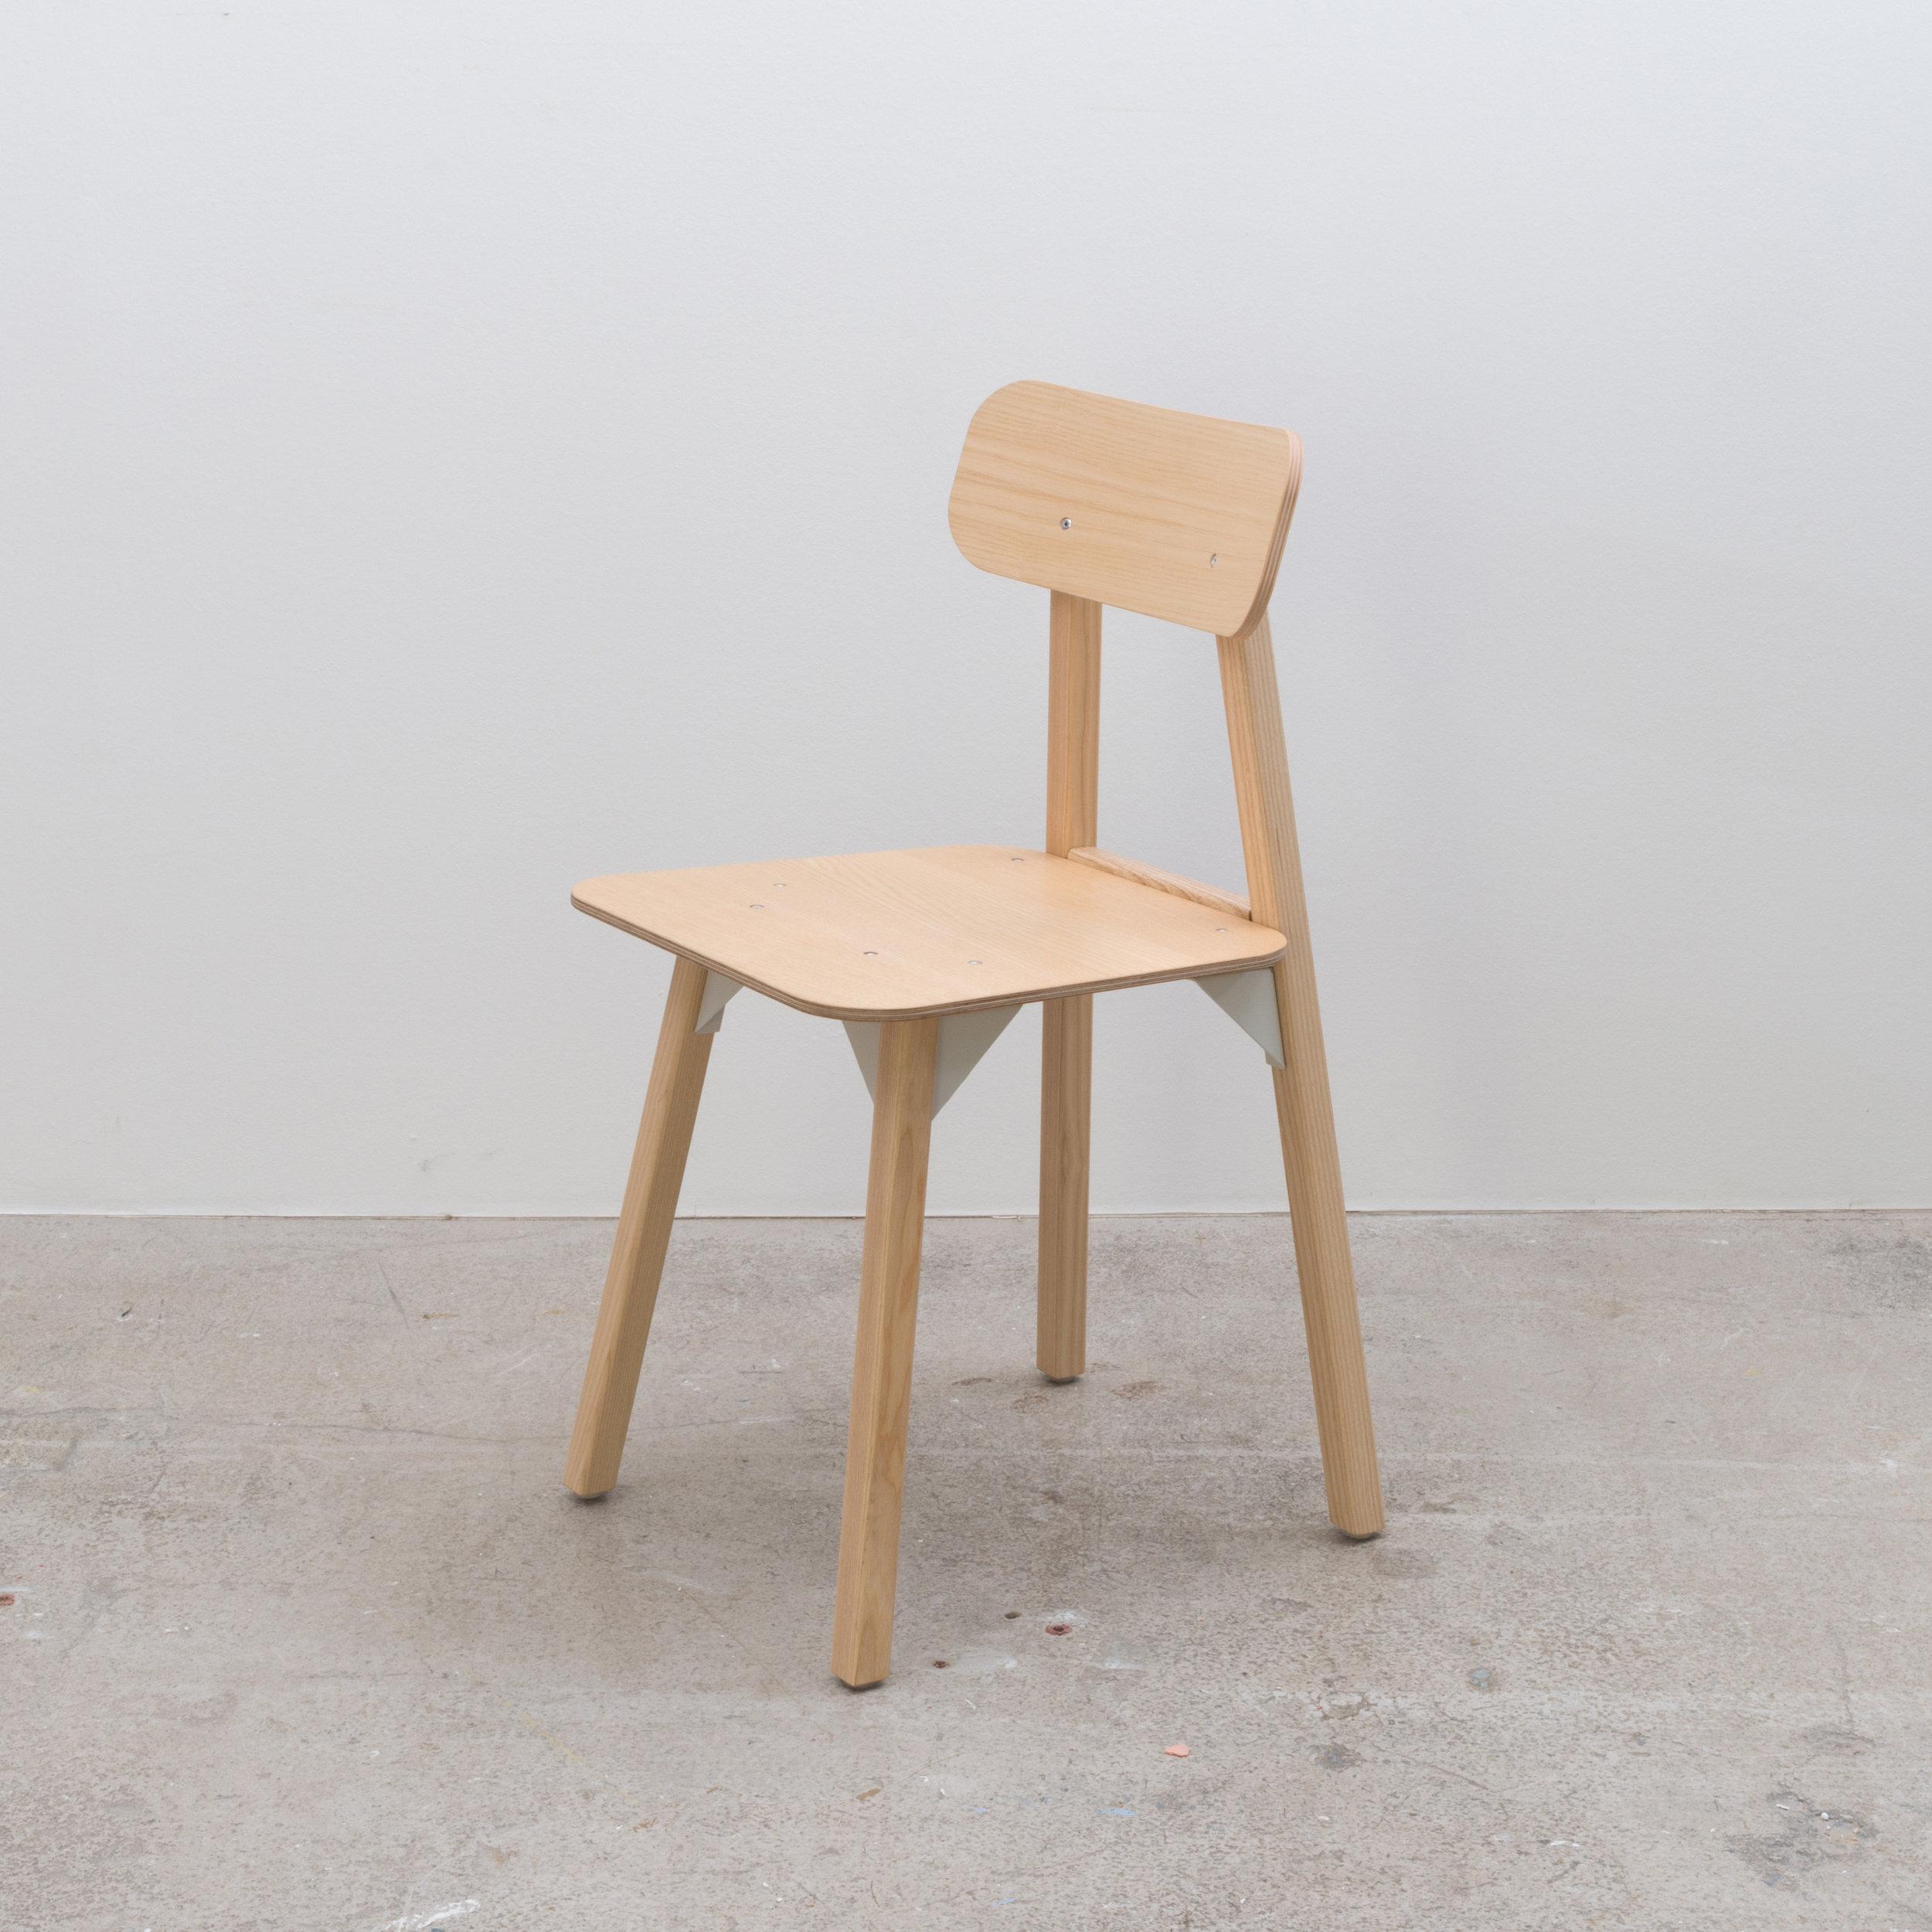 Ash and Ash veneered ply chair. 405 x 490 x 780H